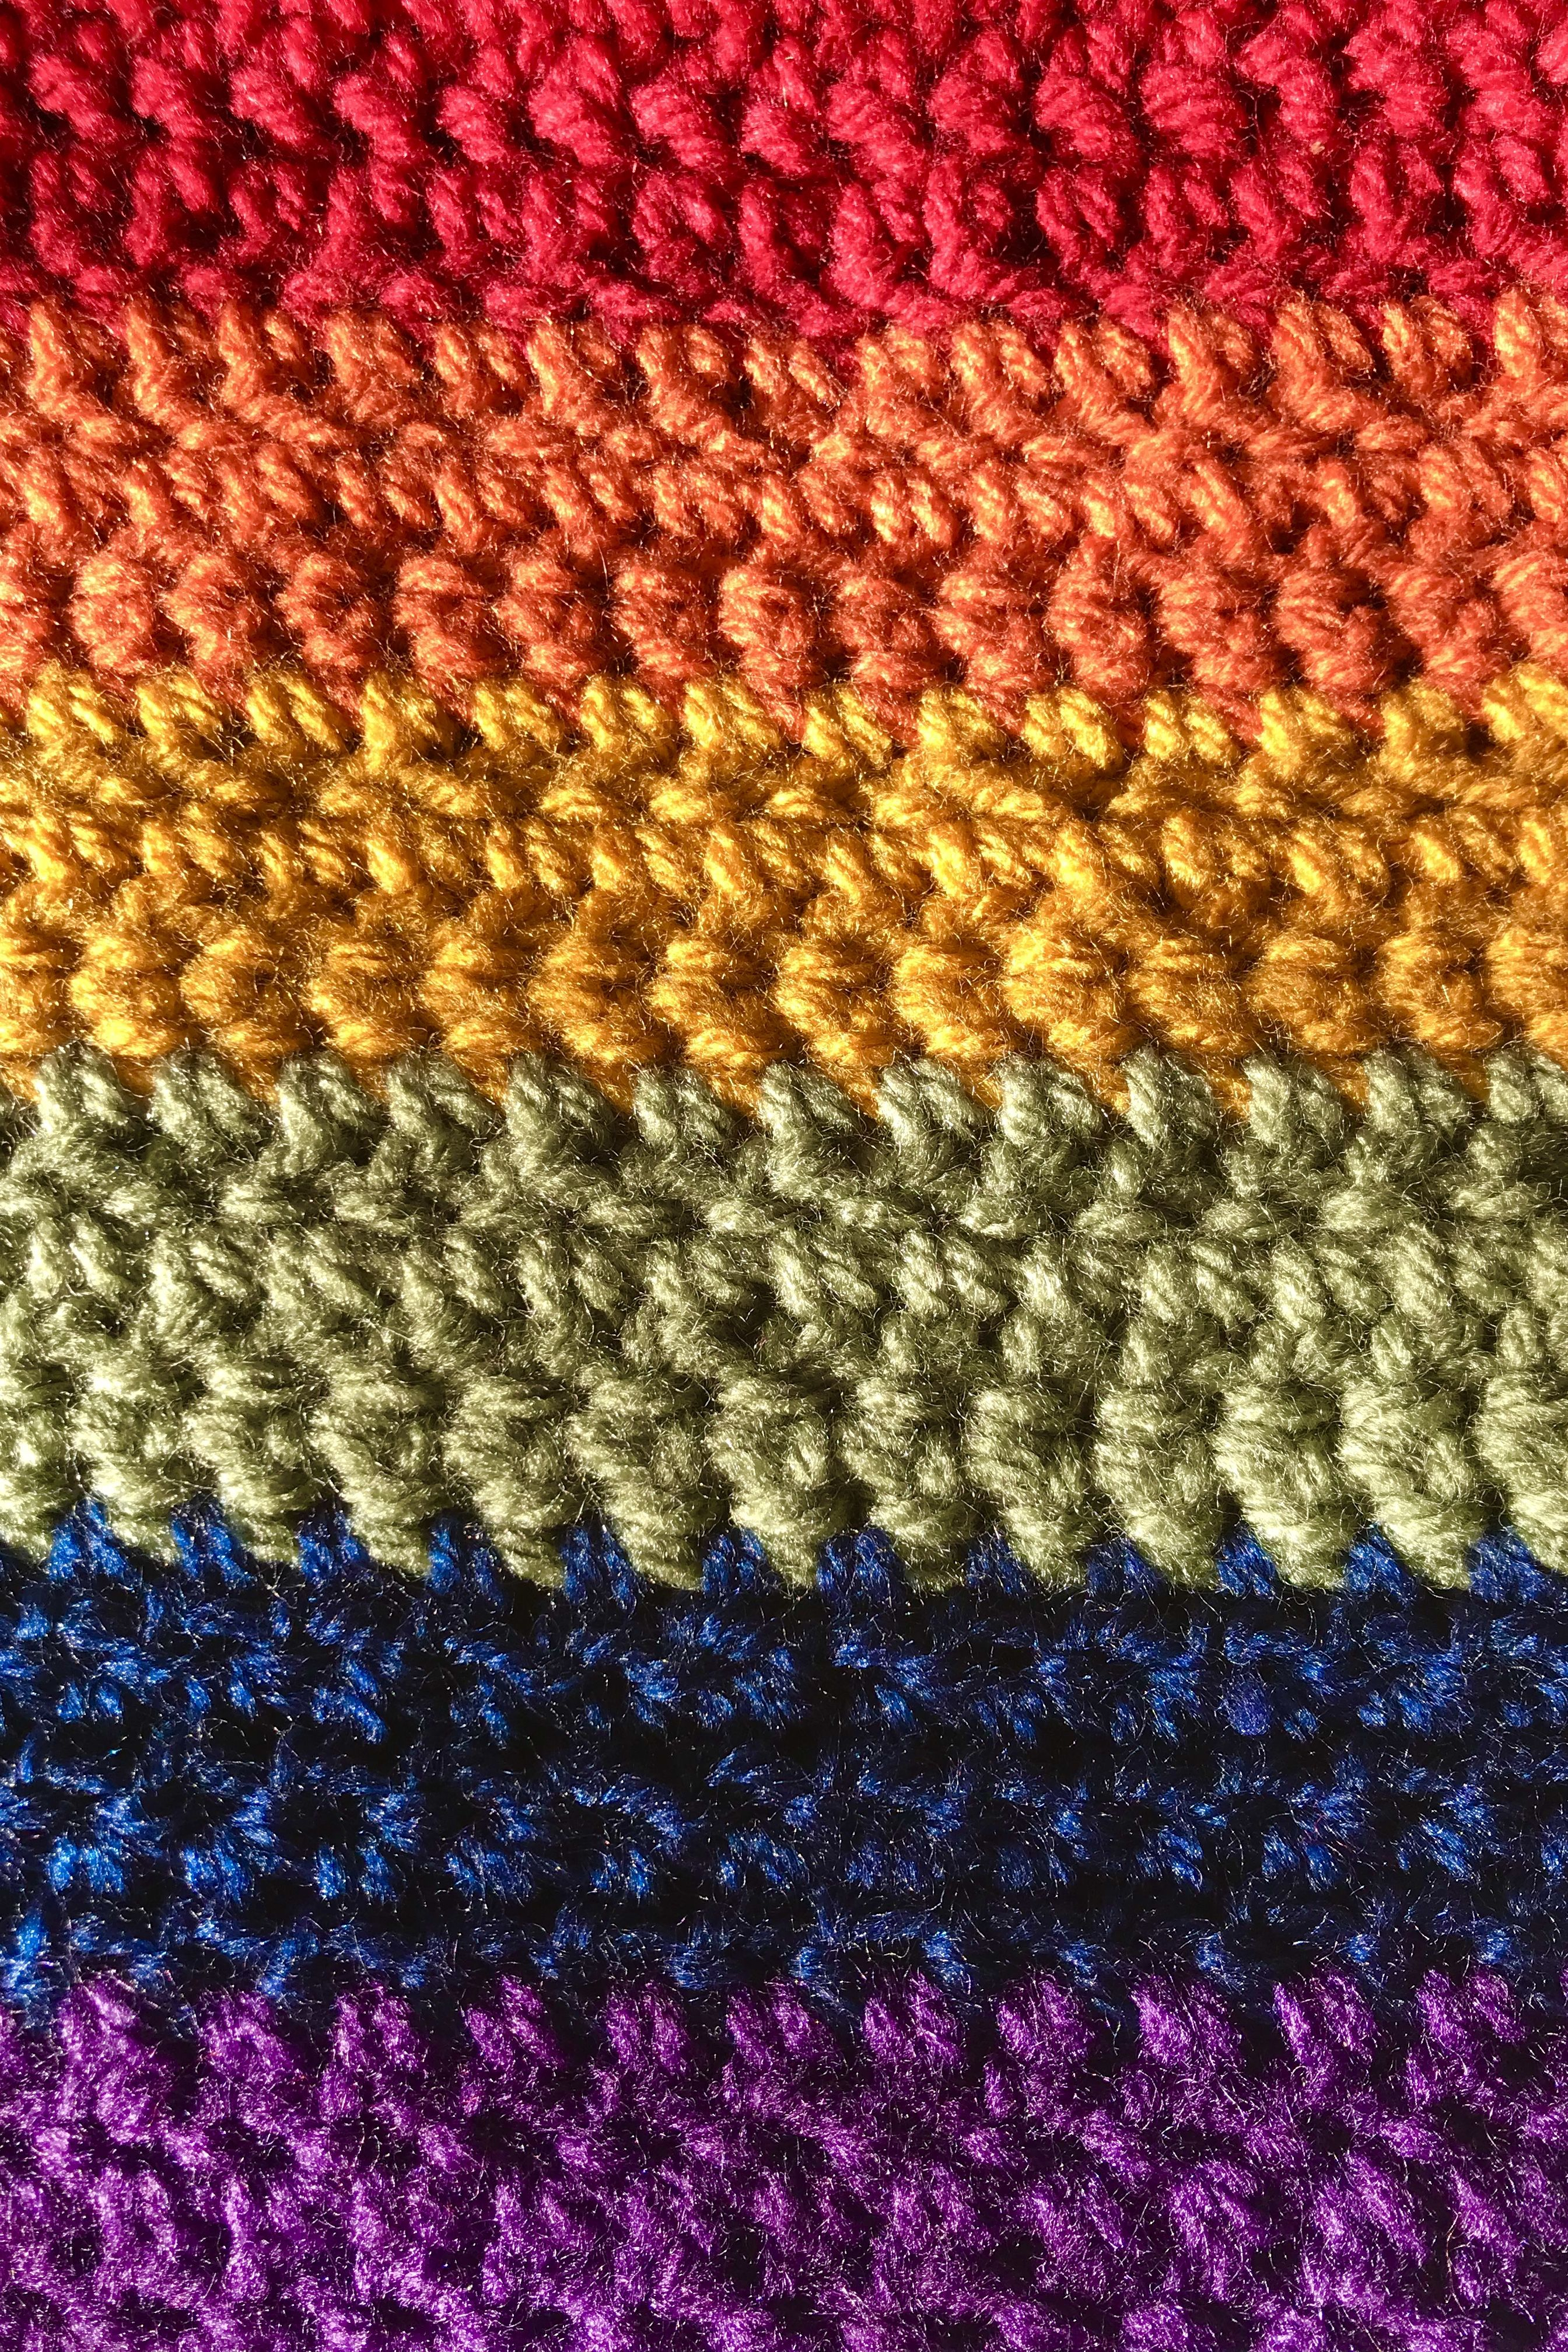 Crochet Rainbow Winter Iphone Background Wallpaper Winter Backgrounds Iphone Iphone Background Wallpaper Crochet Art